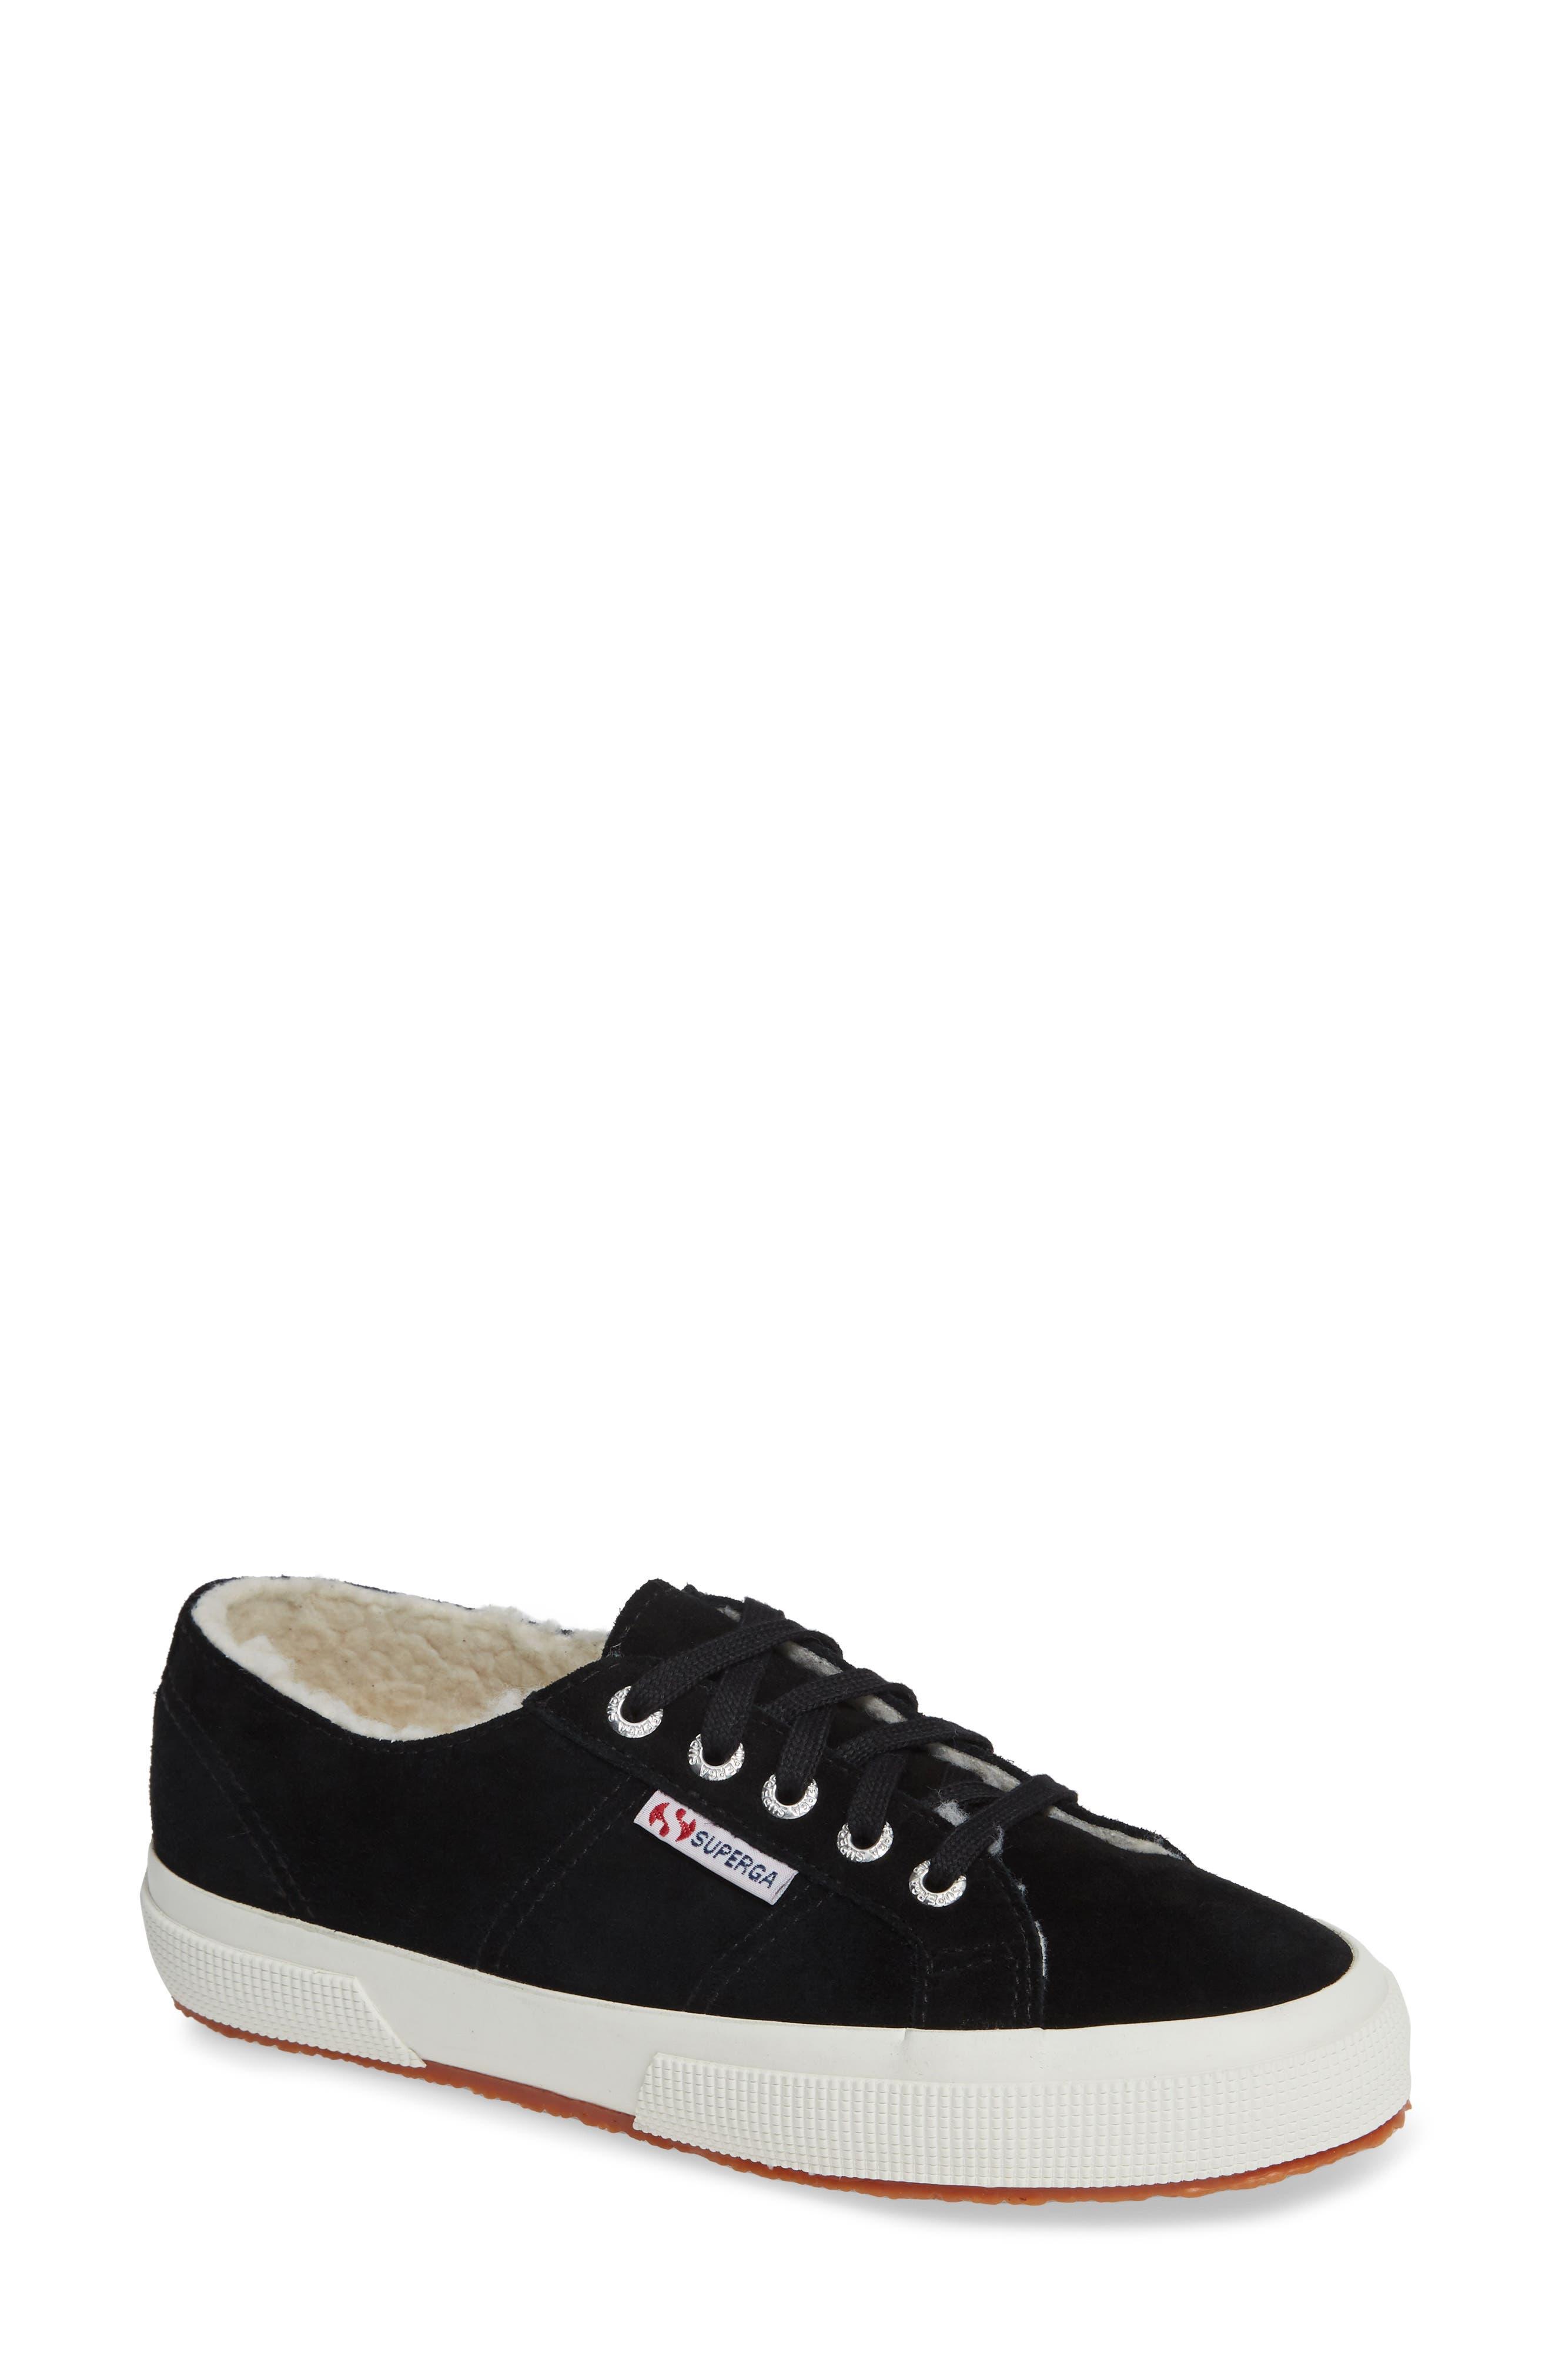 2750 Suefurw Sneaker,                             Main thumbnail 1, color,                             BLACK SUEDE